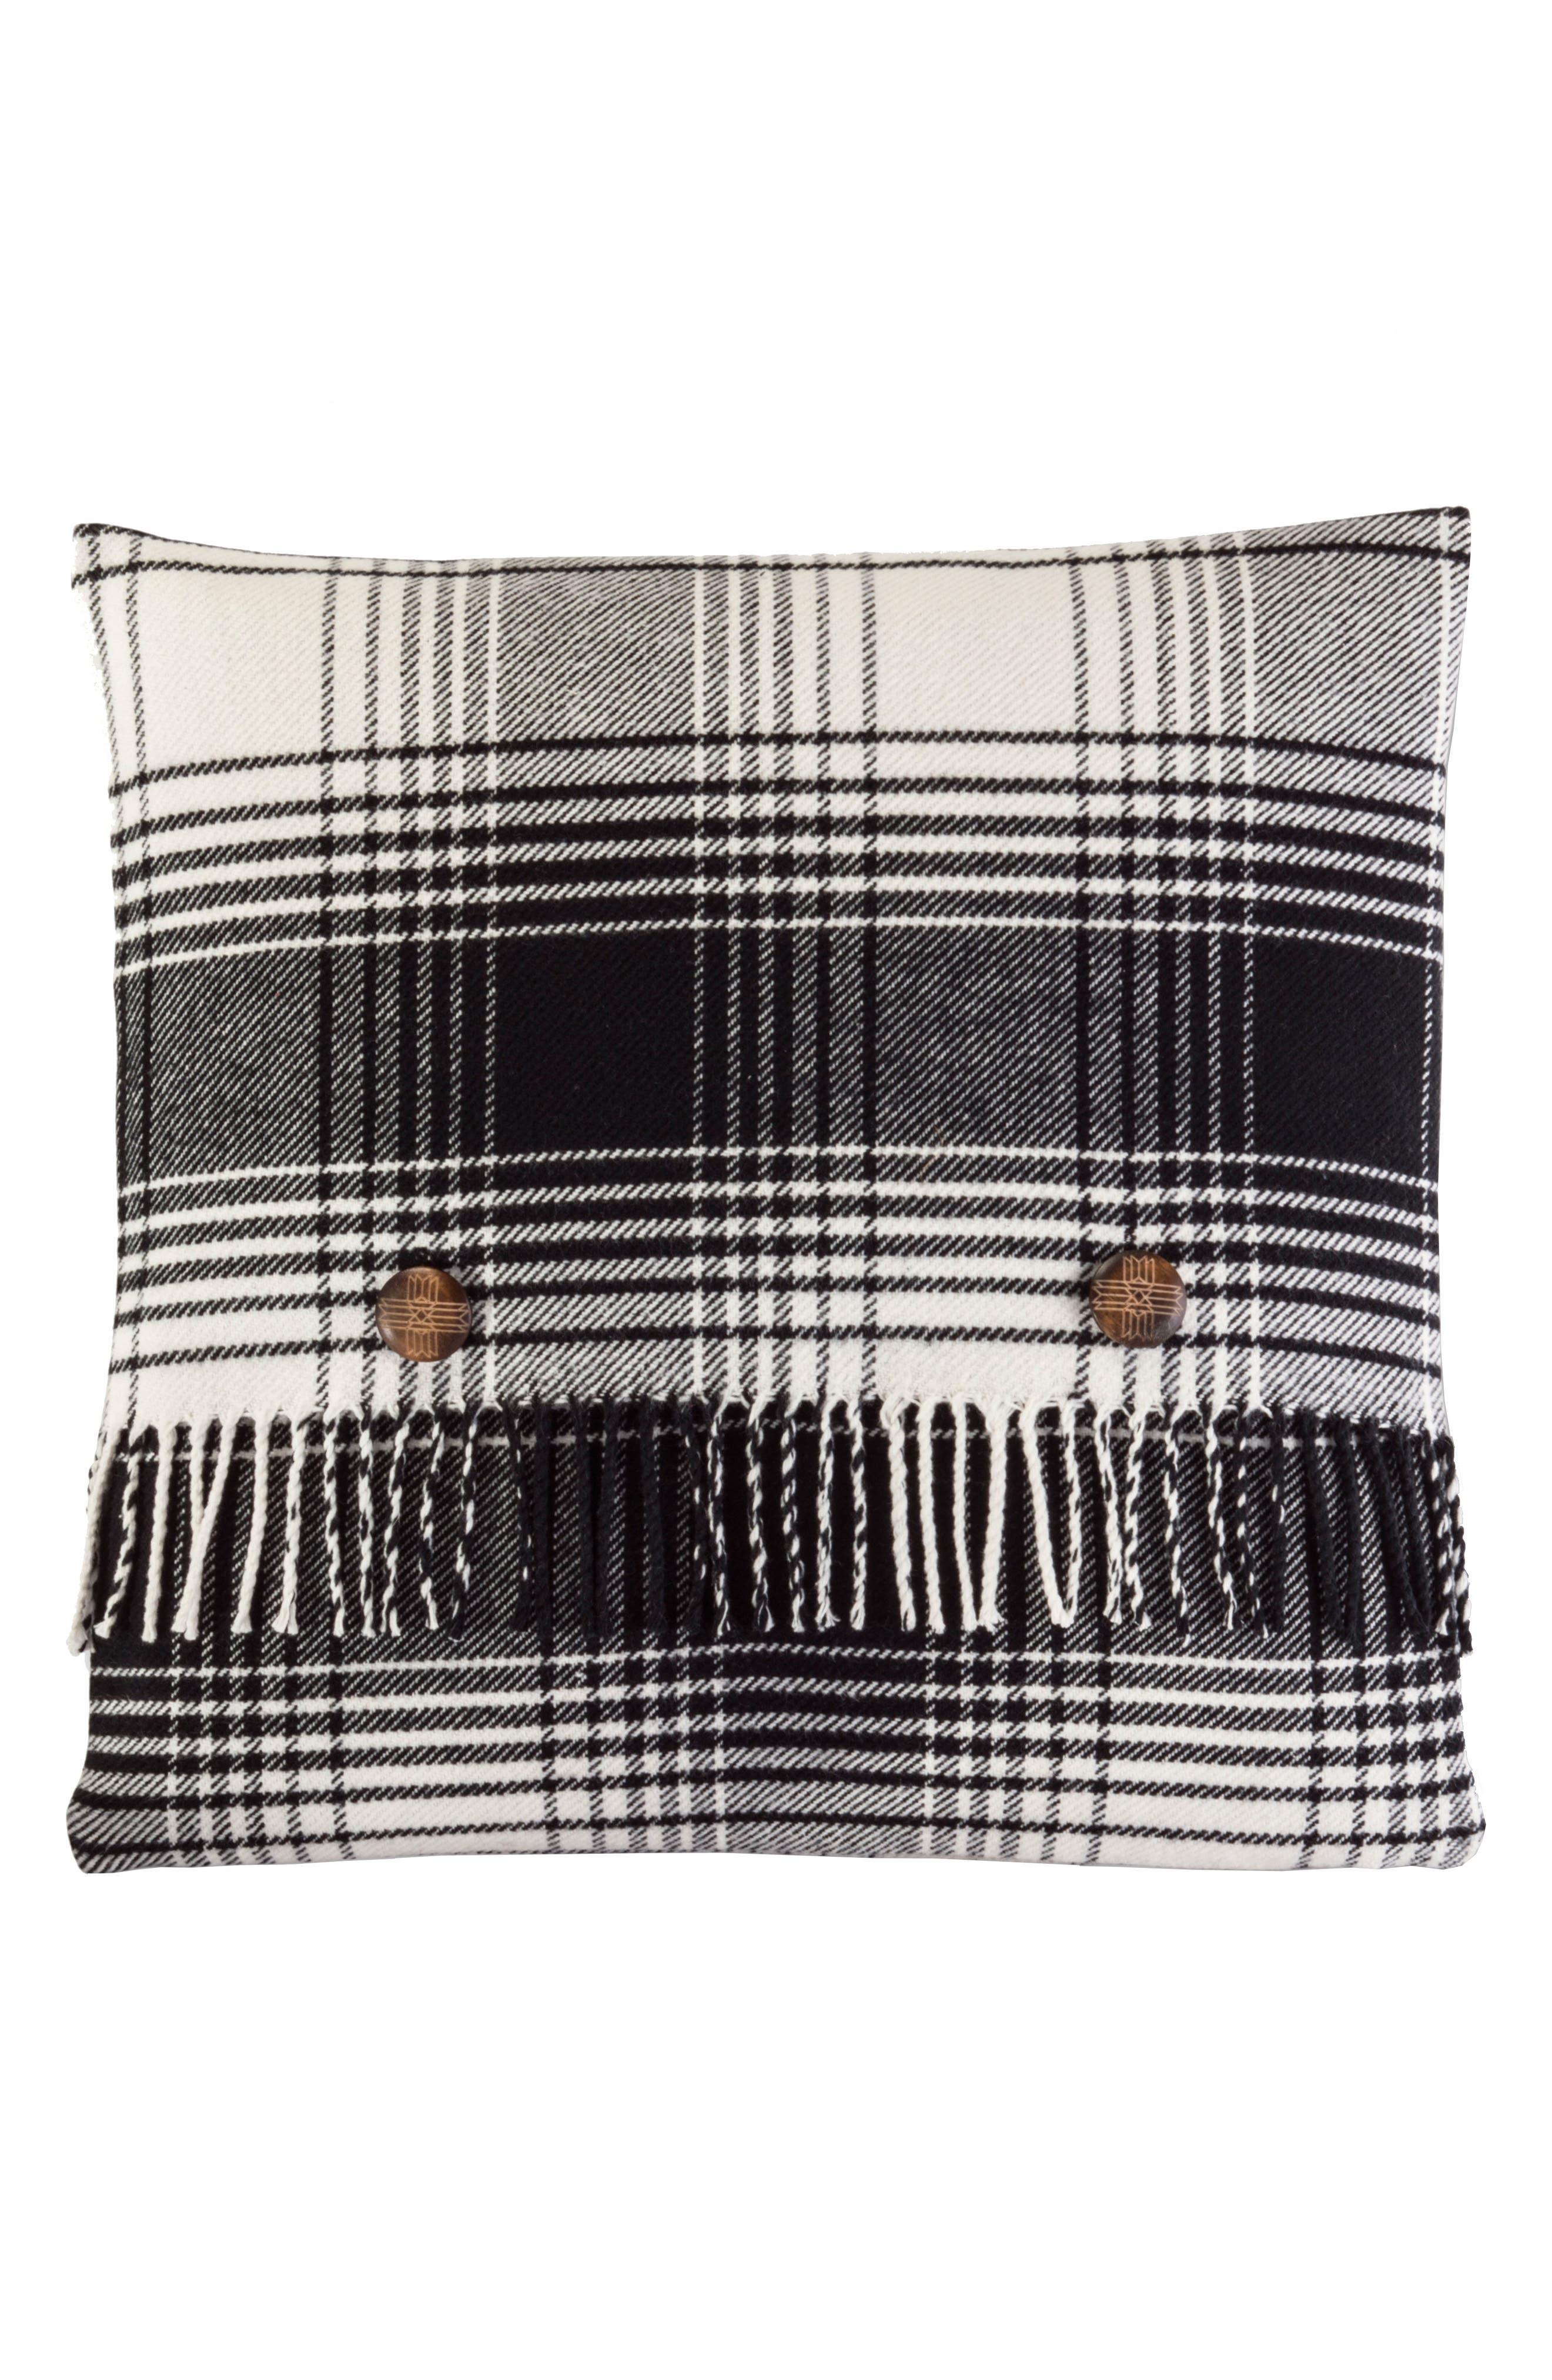 Warren Plaid Pillow,                         Main,                         color, Black And White